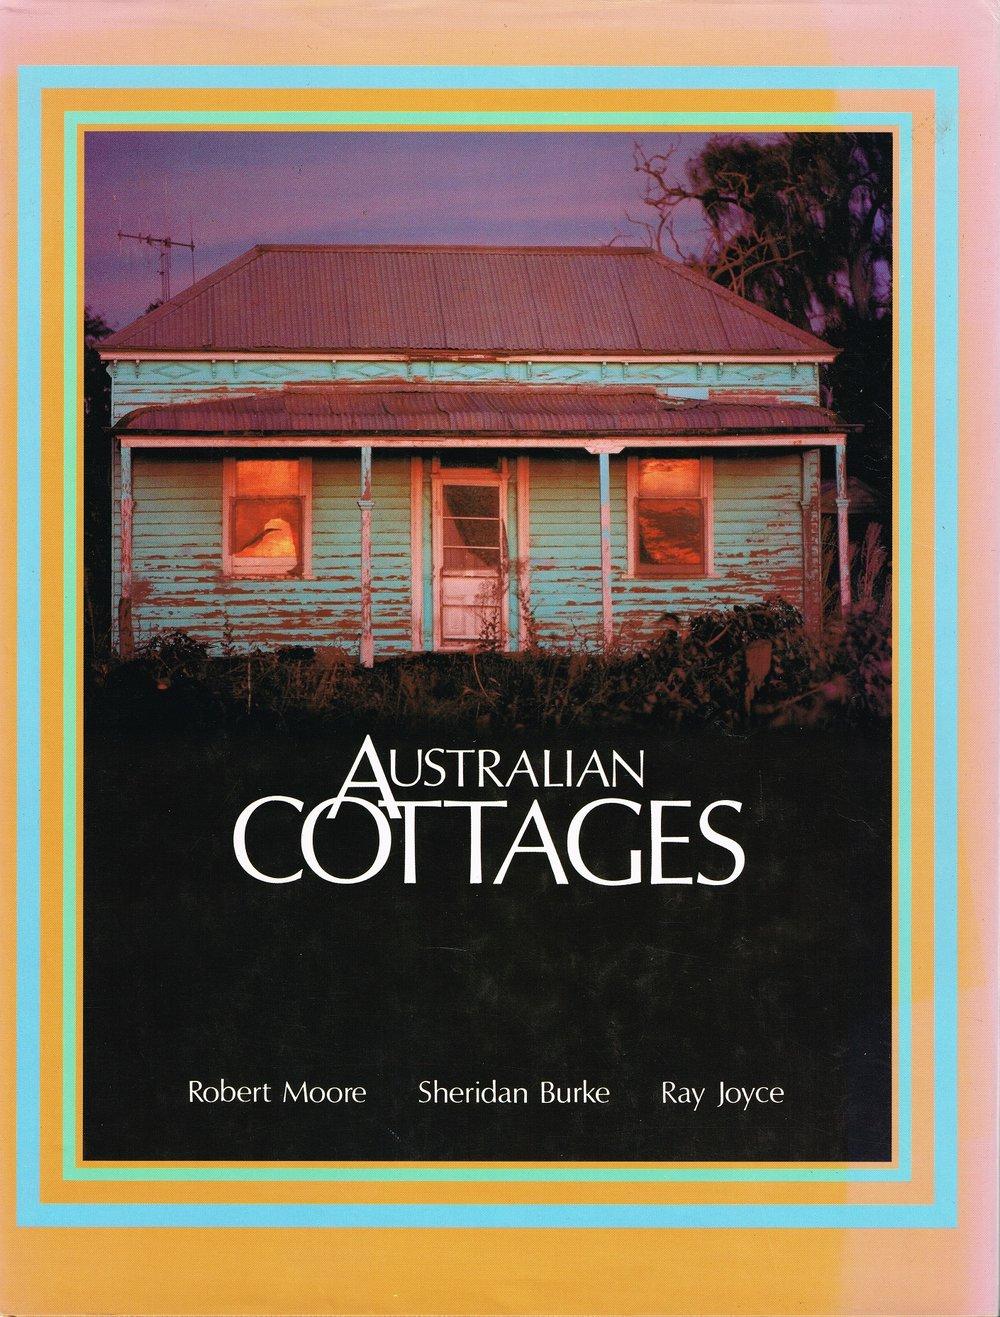 Australian Cottages  Robert Moore, Sheridan Burke and Ray Joyce